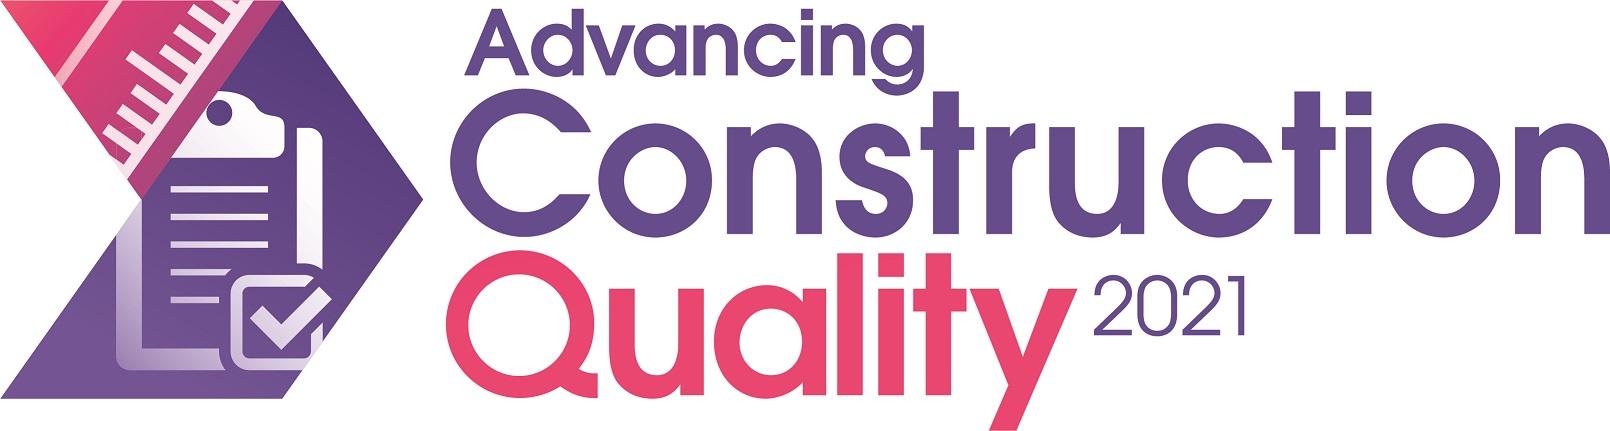 Advancing-Construction-Quality-2021-logo